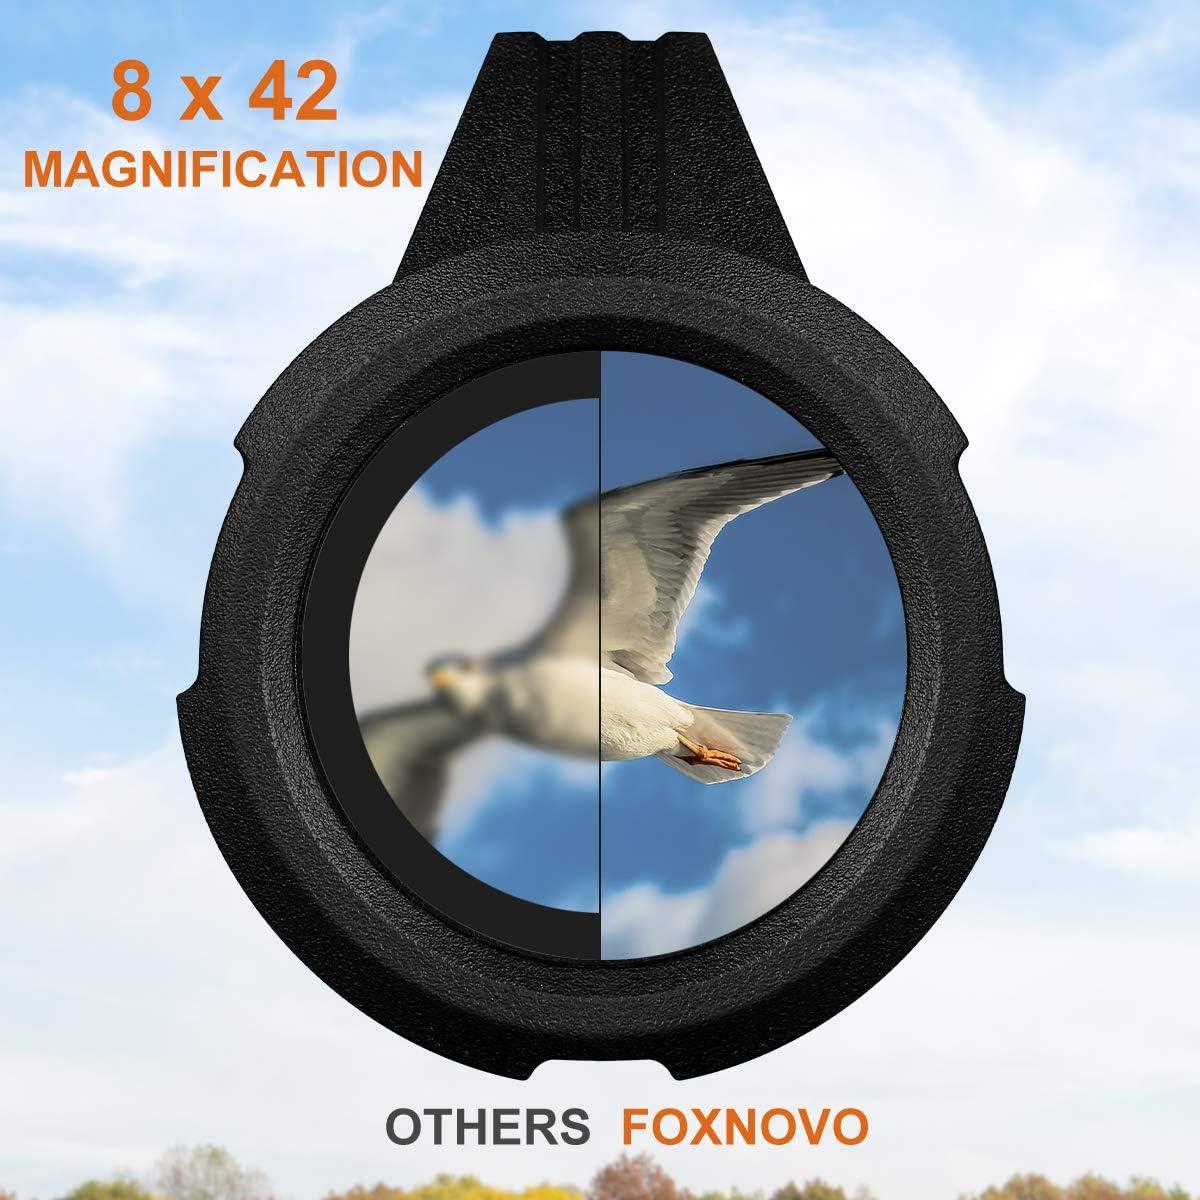 Foxnovo Monocular Telescope 8×42 High Power Monoculars Scope Portable Scope Smartphone Tripod Scope, Waterproof Shockproof HD BAK4 Prism FMC Monoscope for Bird Watching, Hunting, Camping, Wildlife